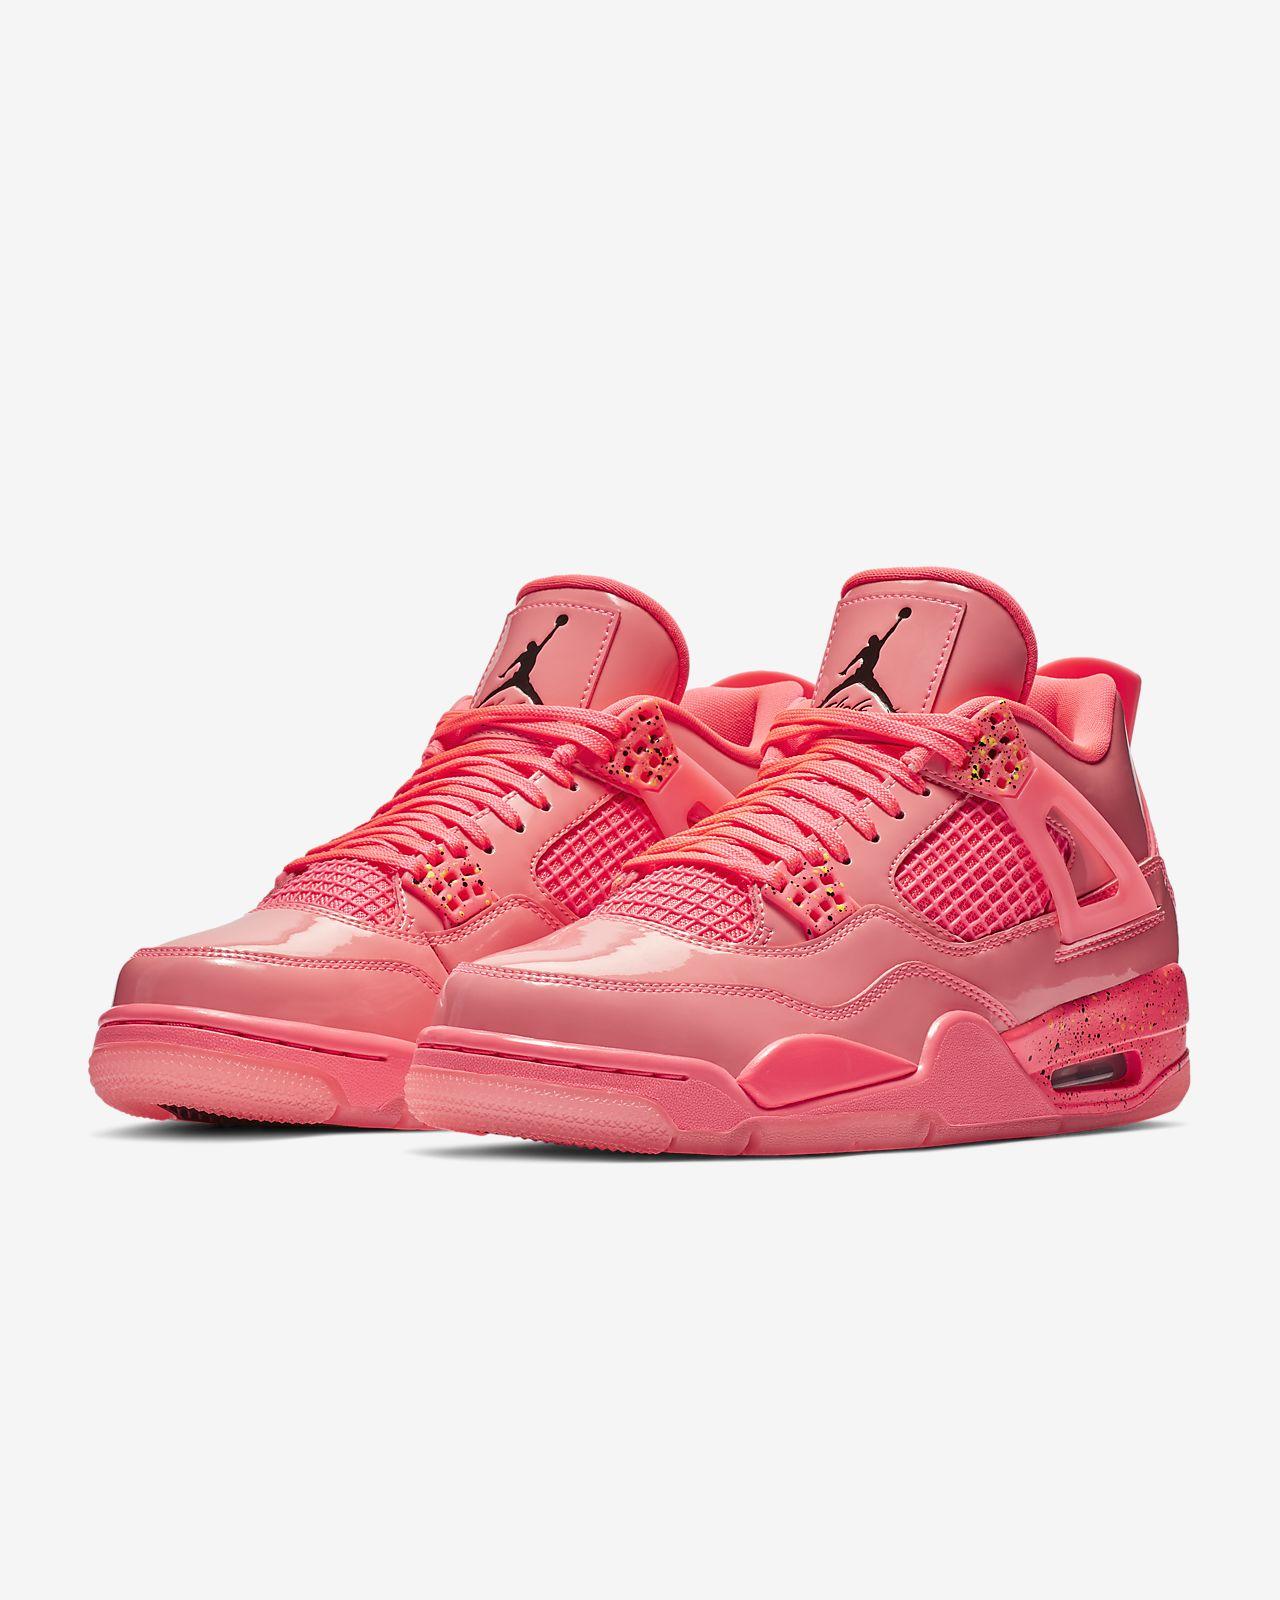 buy online e2e71 33e5d Air Jordan 4 Retro NRG Women's Shoe